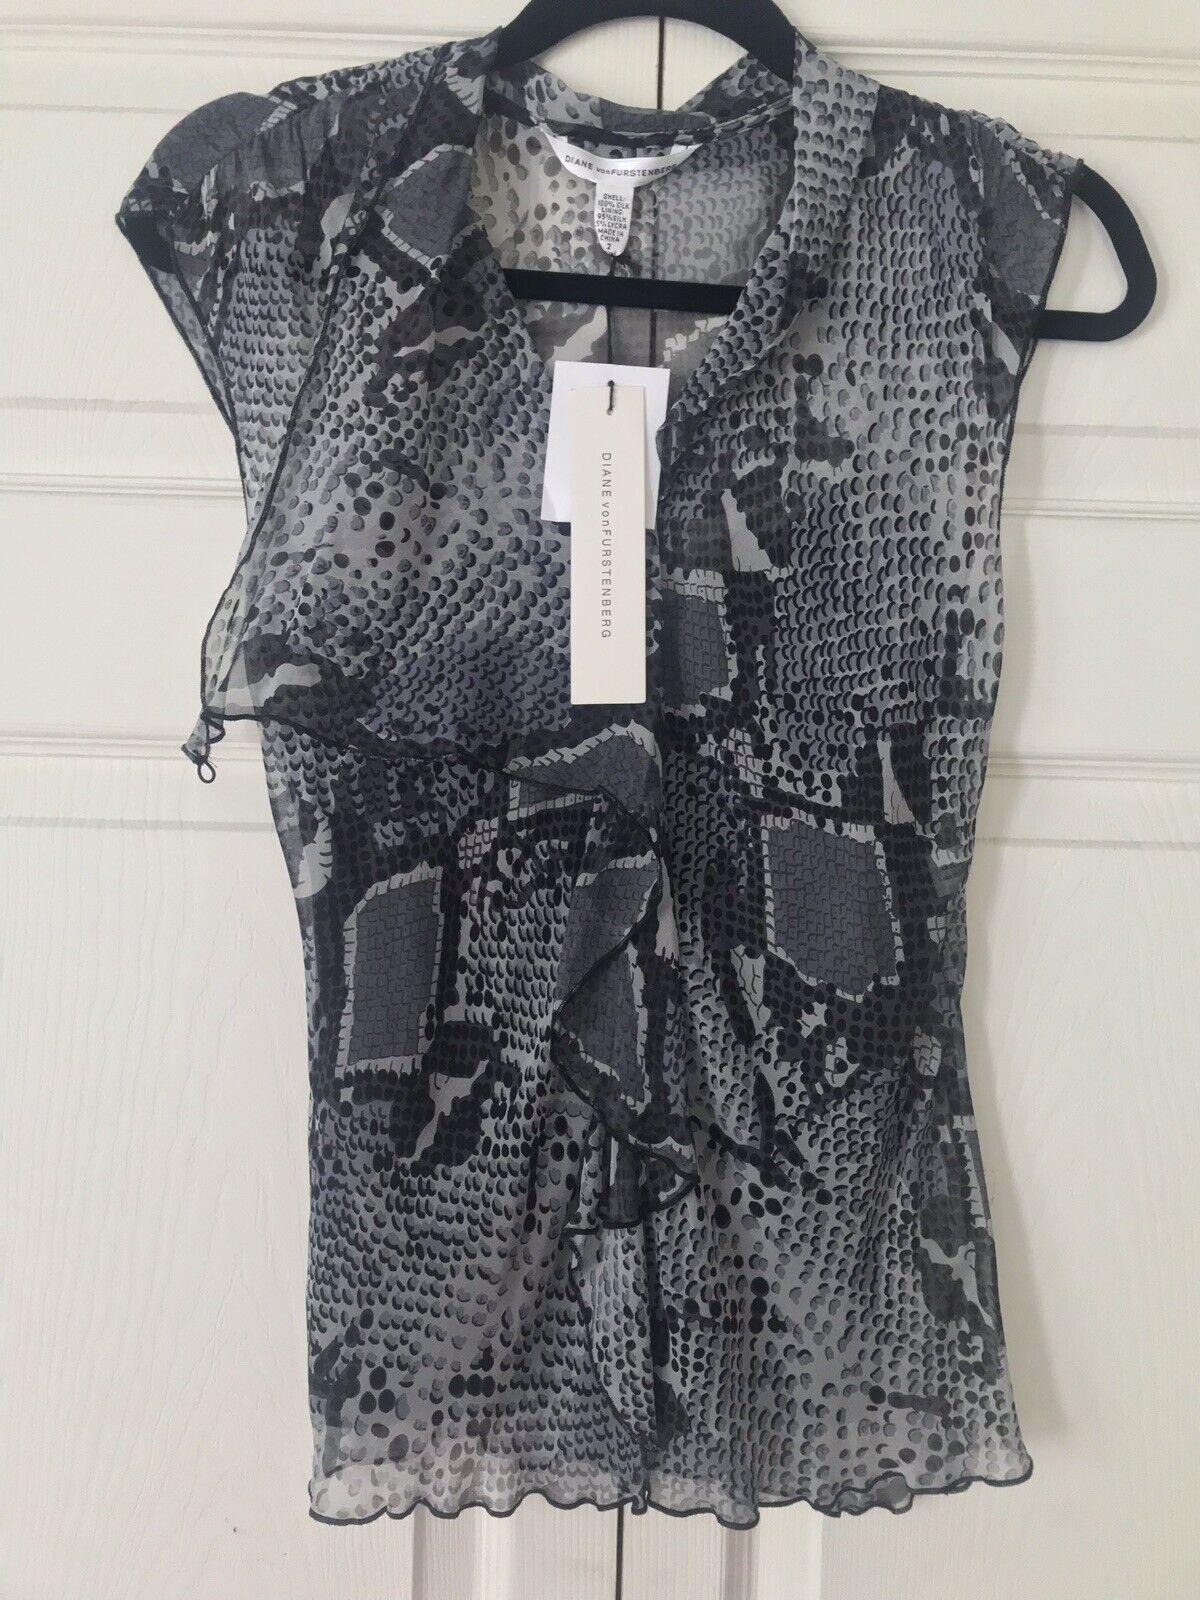 Diane von Furstenberg grau Abstract Leopard Silk Semi-Sheer Blouse Sz 4,6,8 Aval